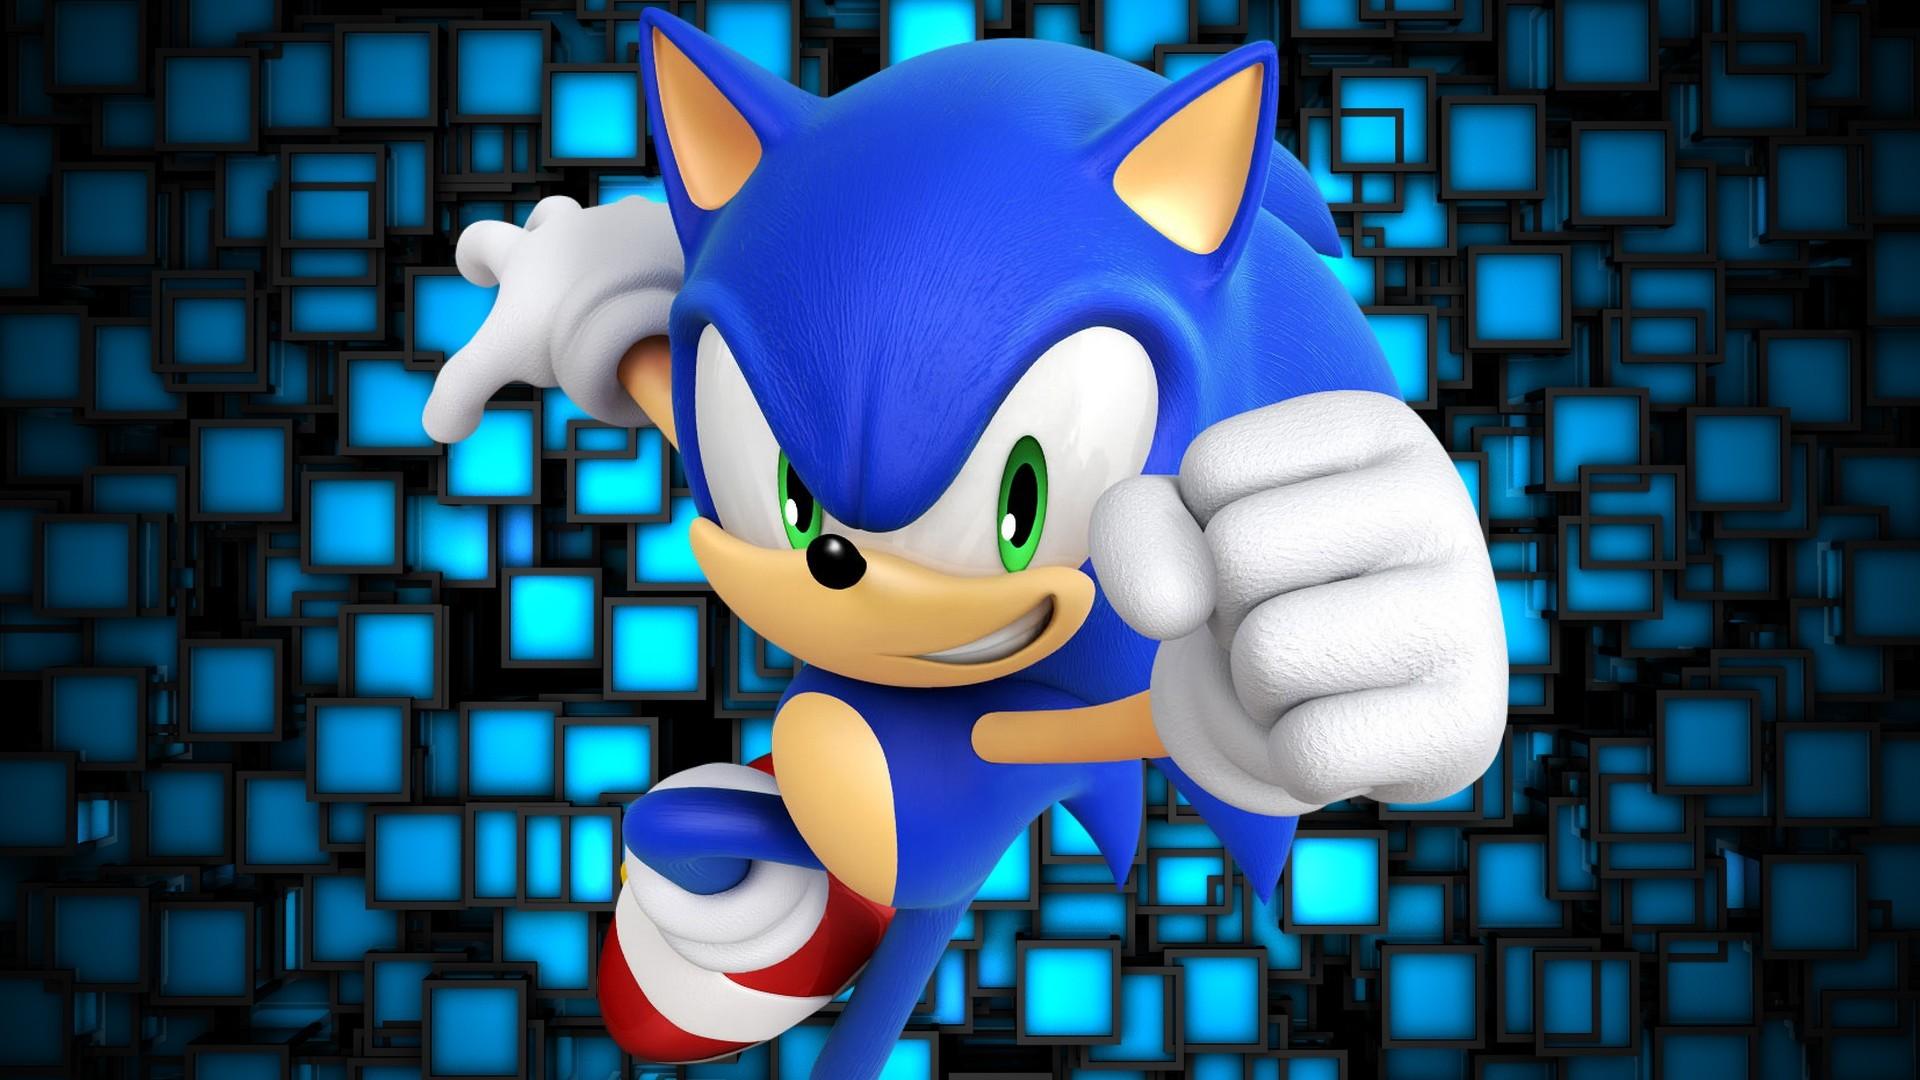 sonic hedgehog wallpaper 183��